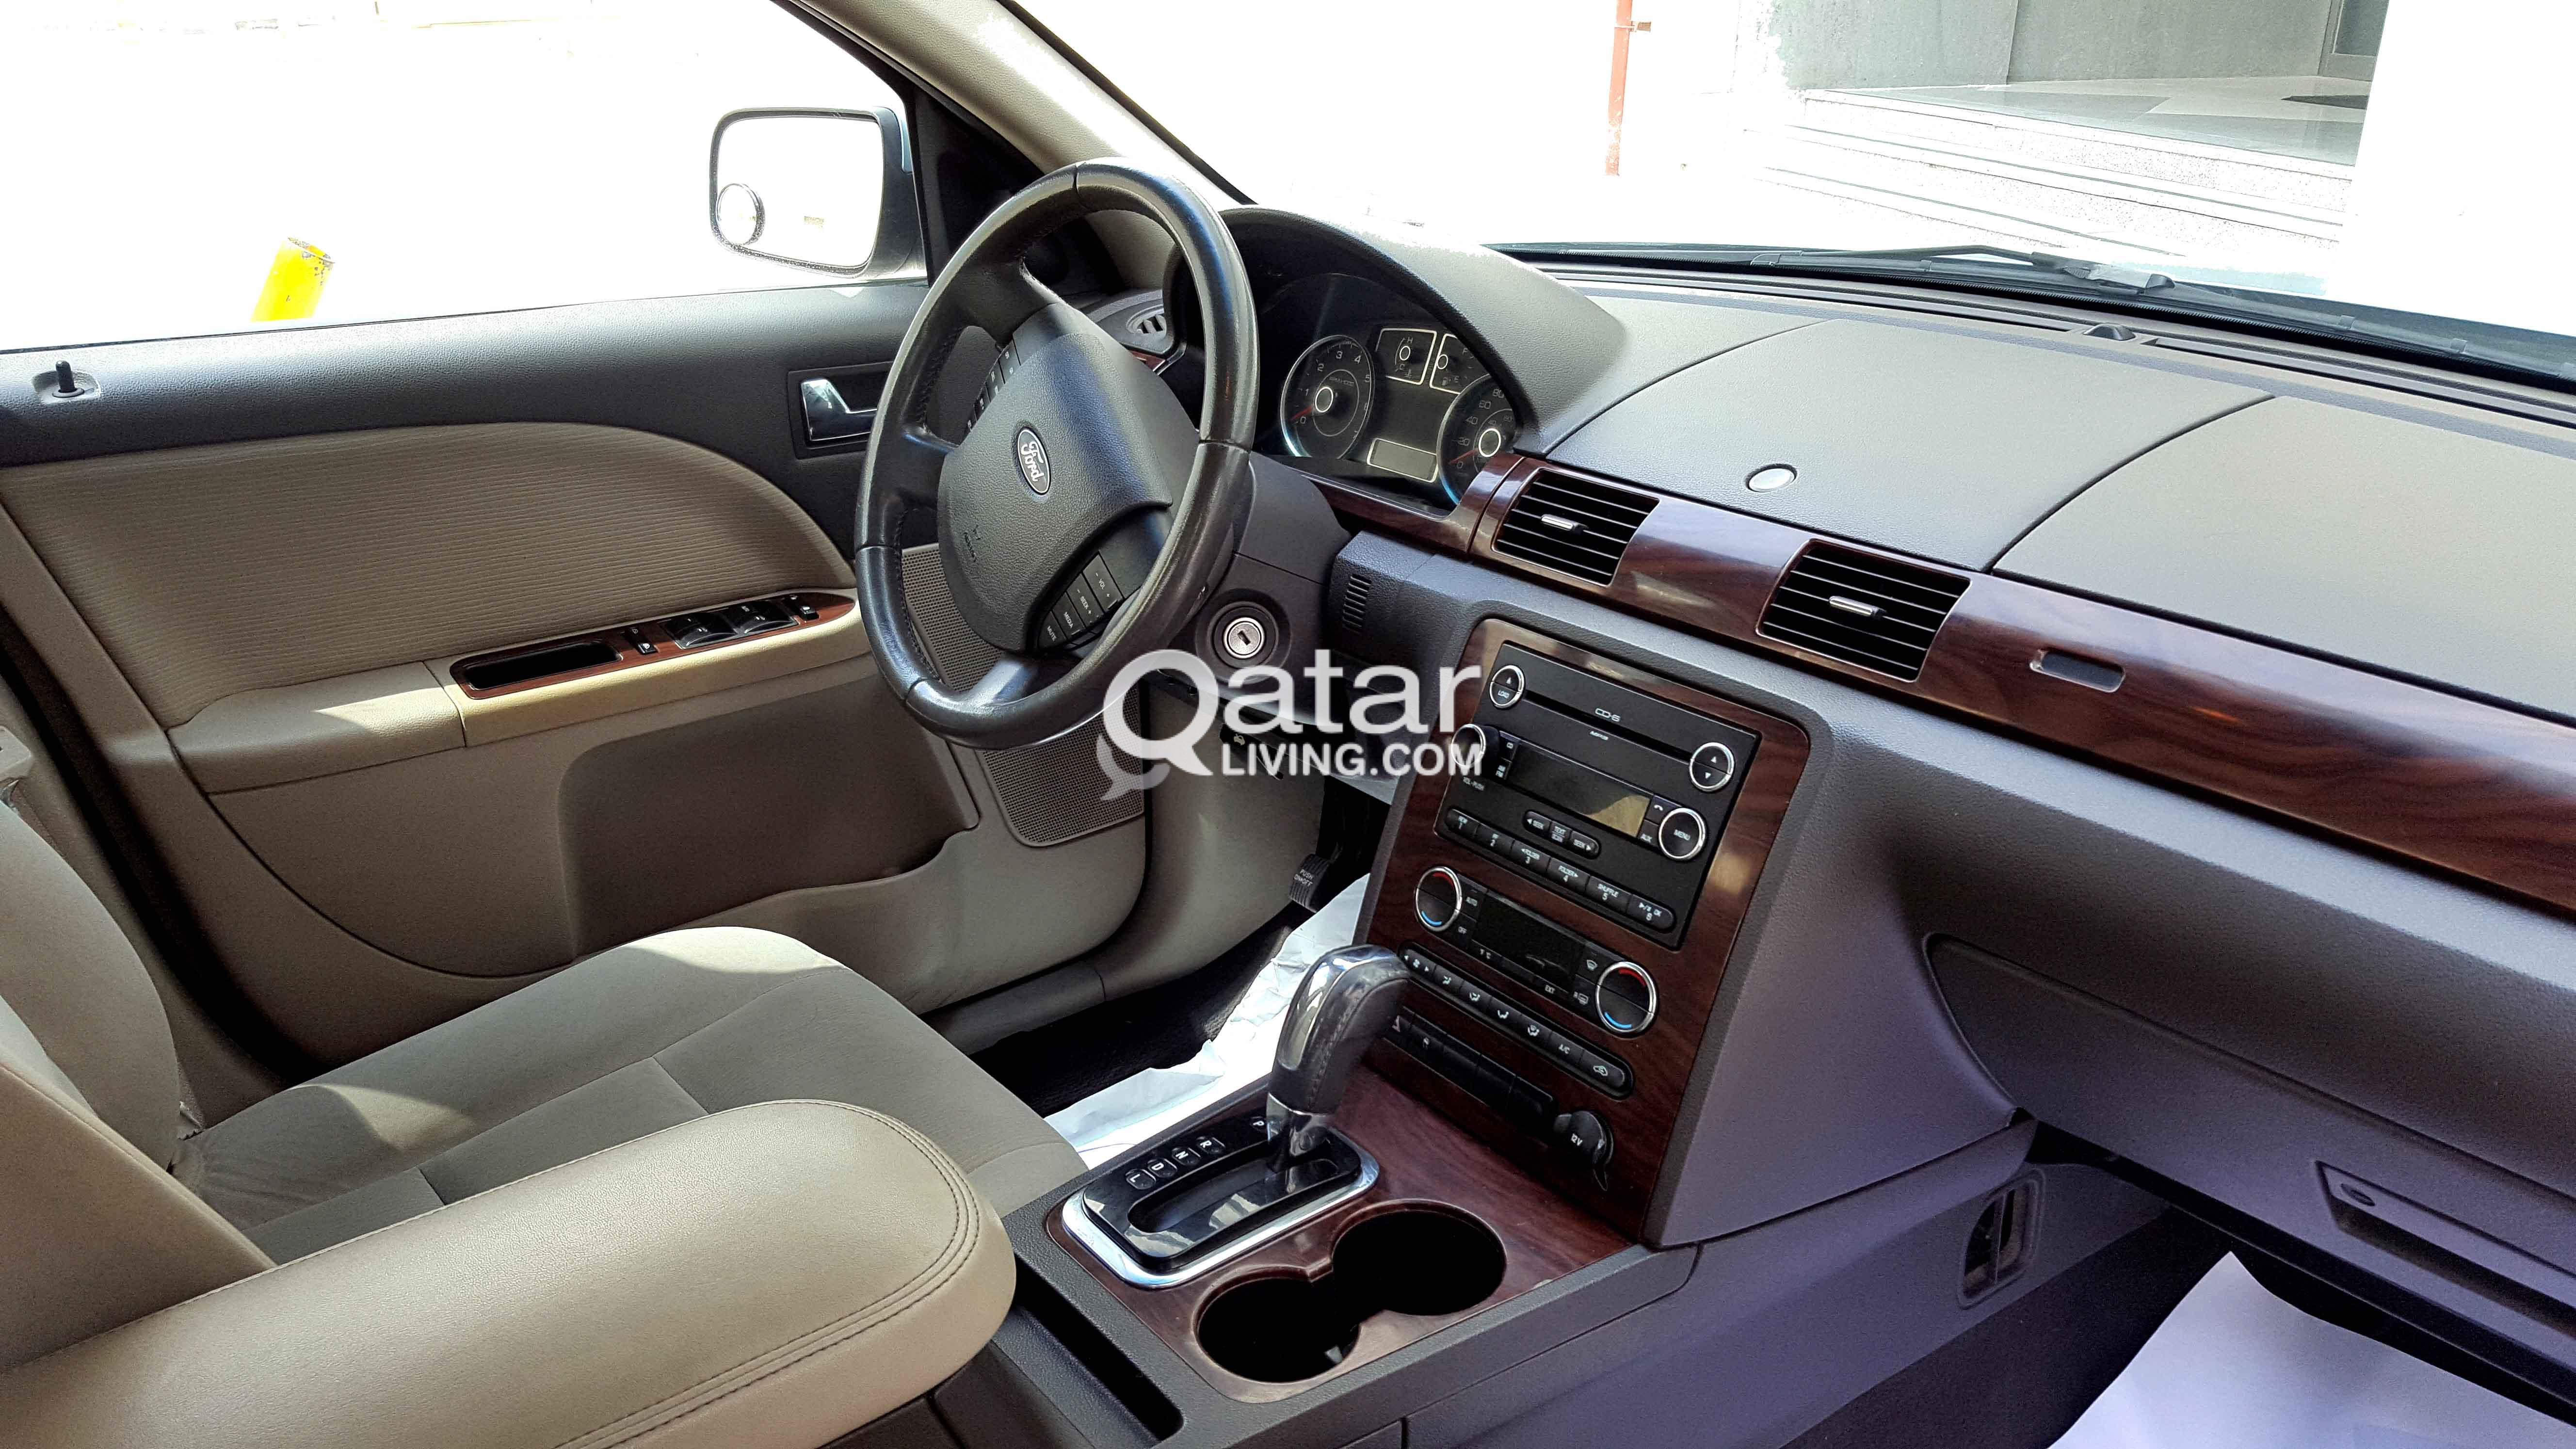 Ford five hundred 2009 qatar living